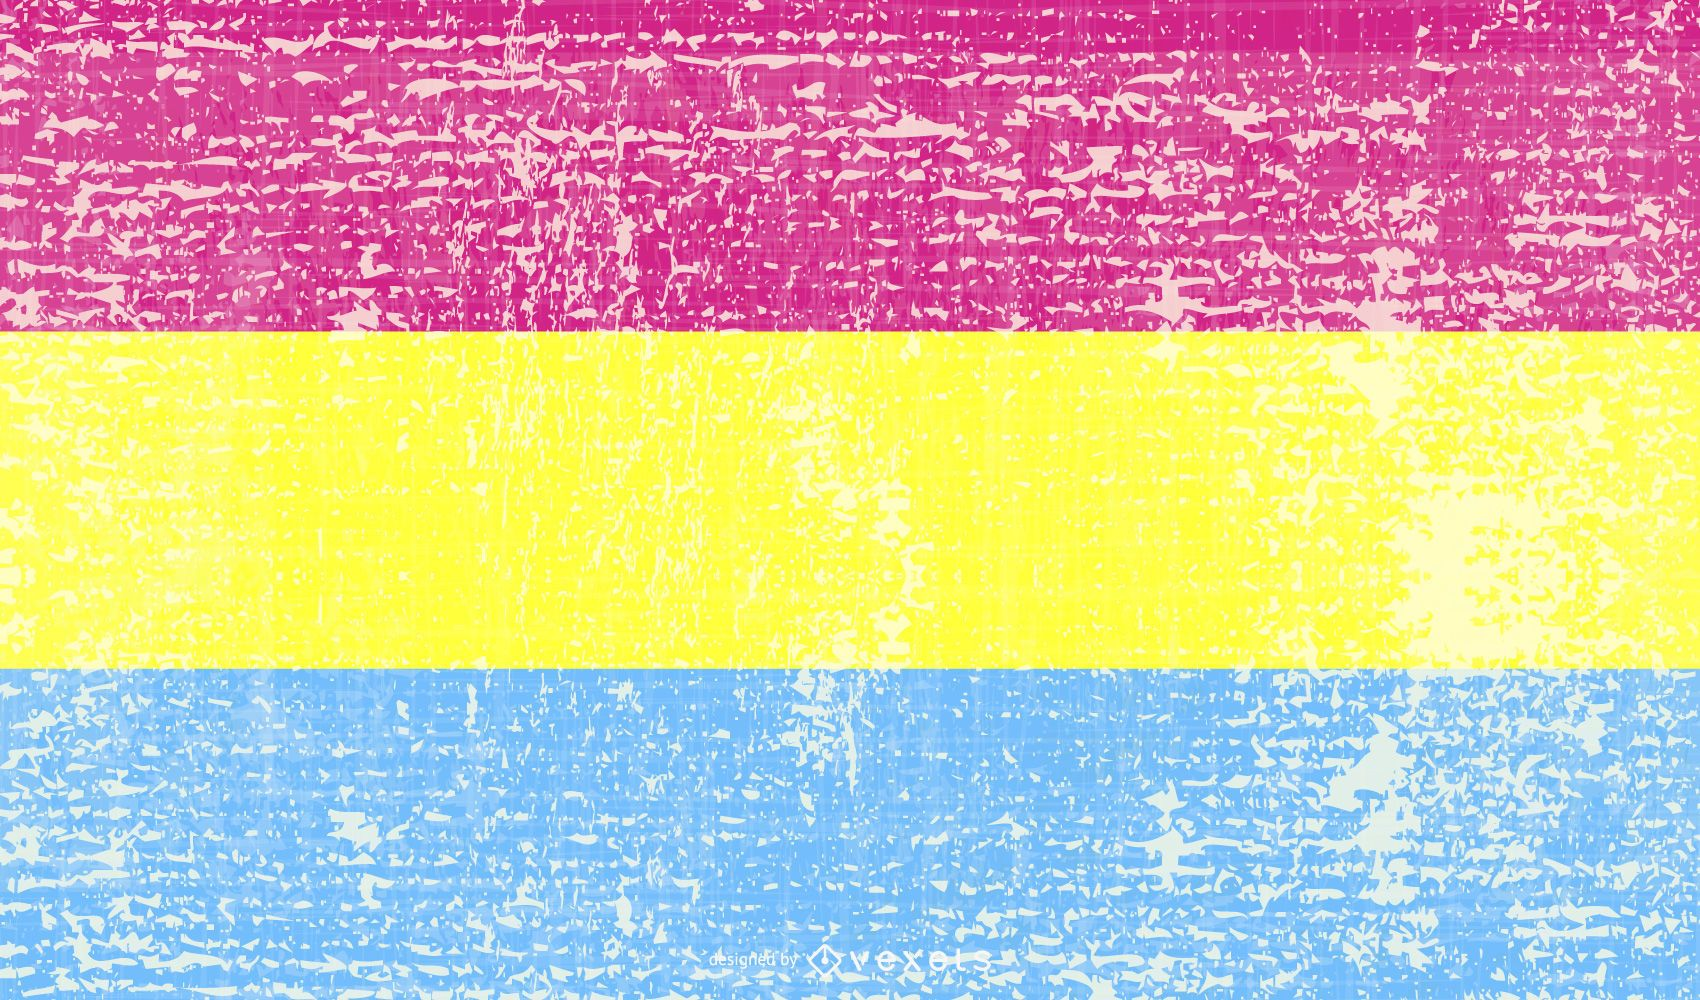 Bandera del orgullo pansexual grunge